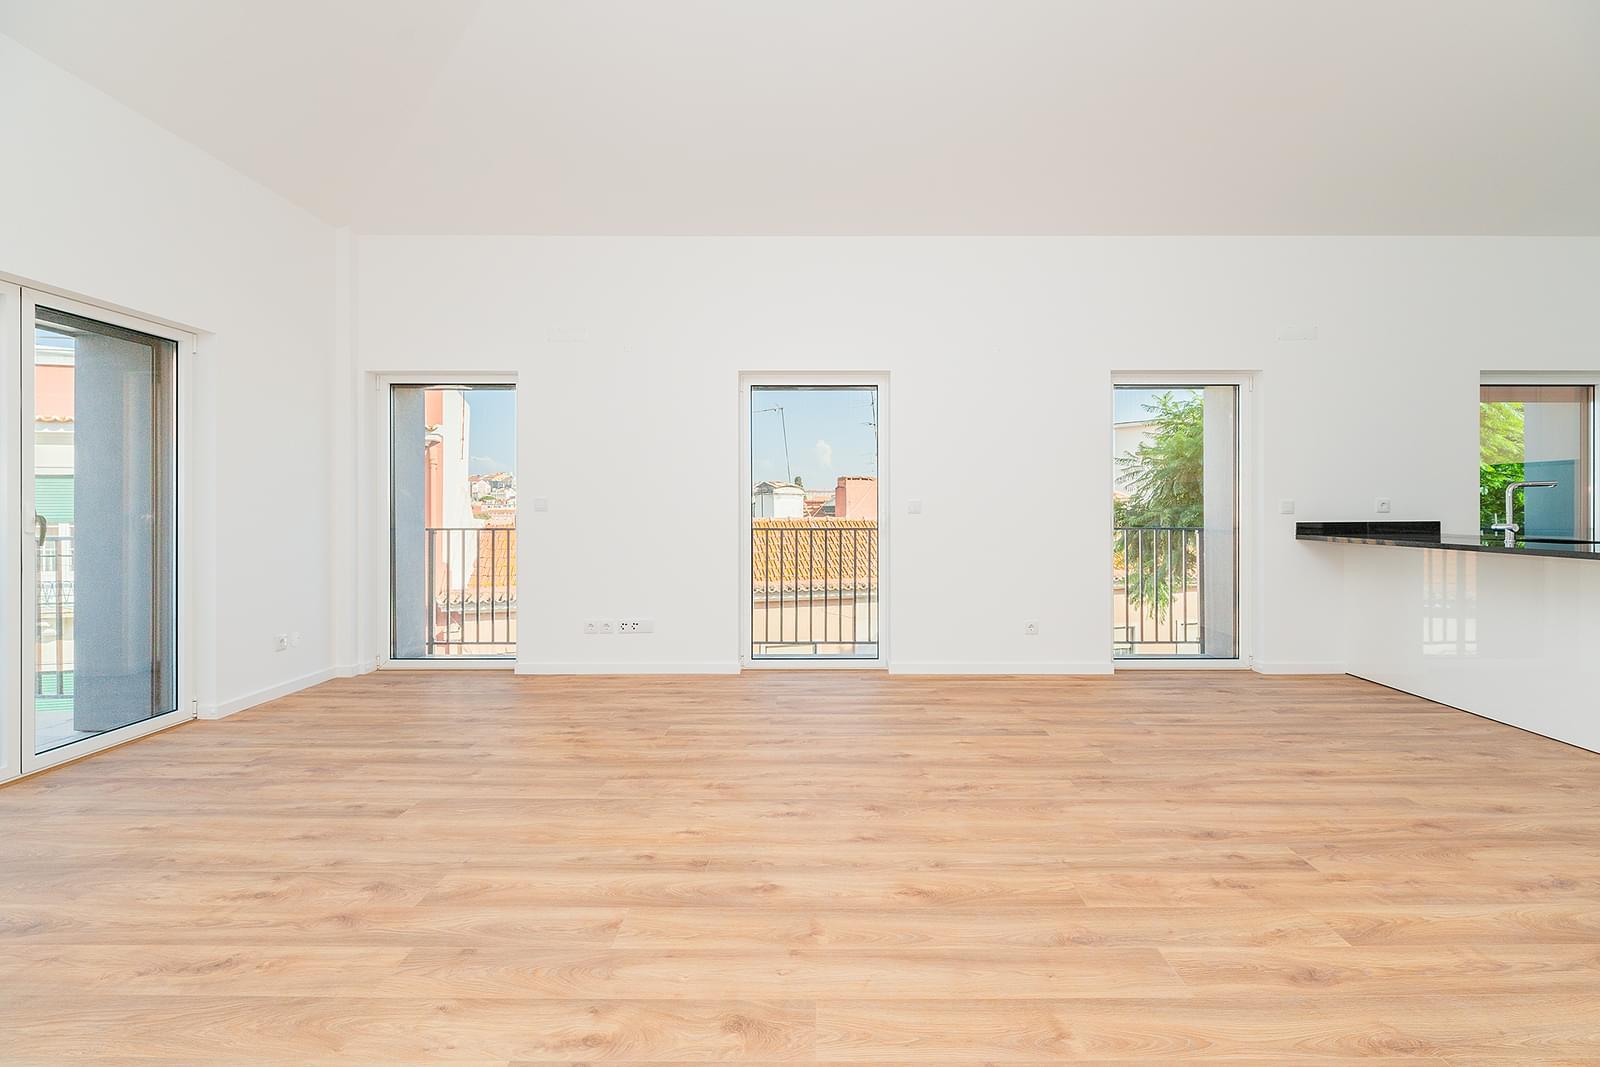 pf18413-apartamento-t1-lisboa-99da8370-9fe5-40f1-95ce-569cccf2ff9e